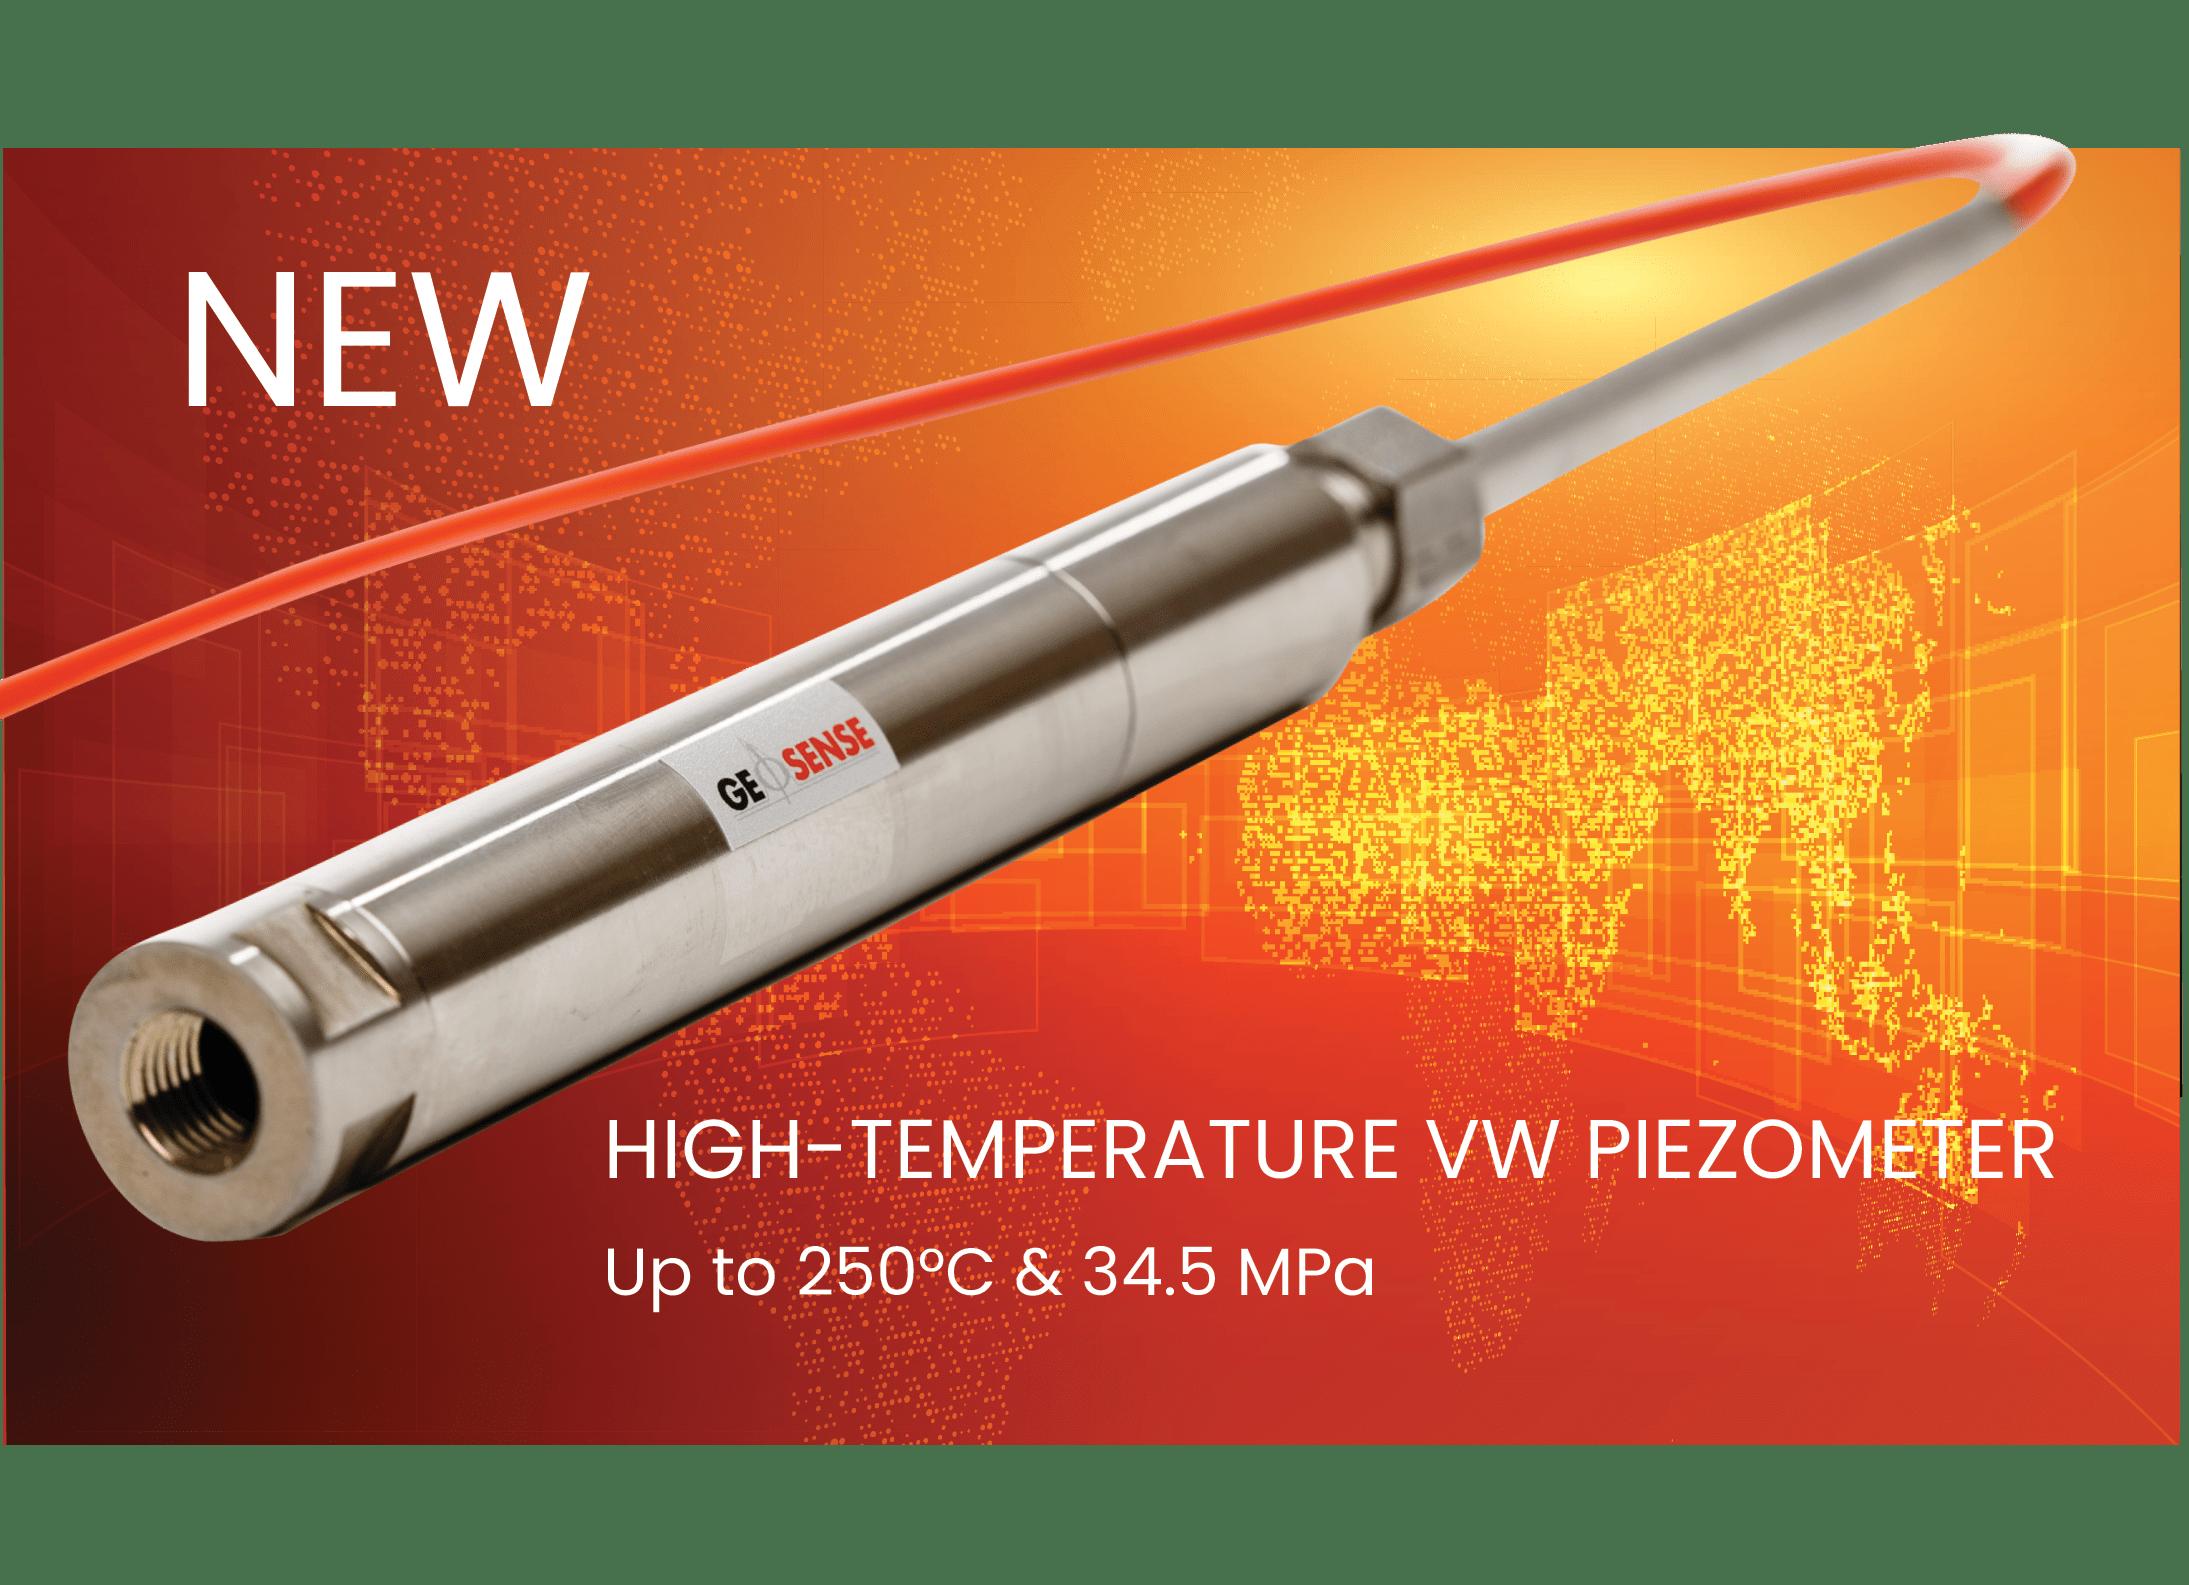 Marketing flyer of new Geosense high temperature piezometer VWPHT-3600